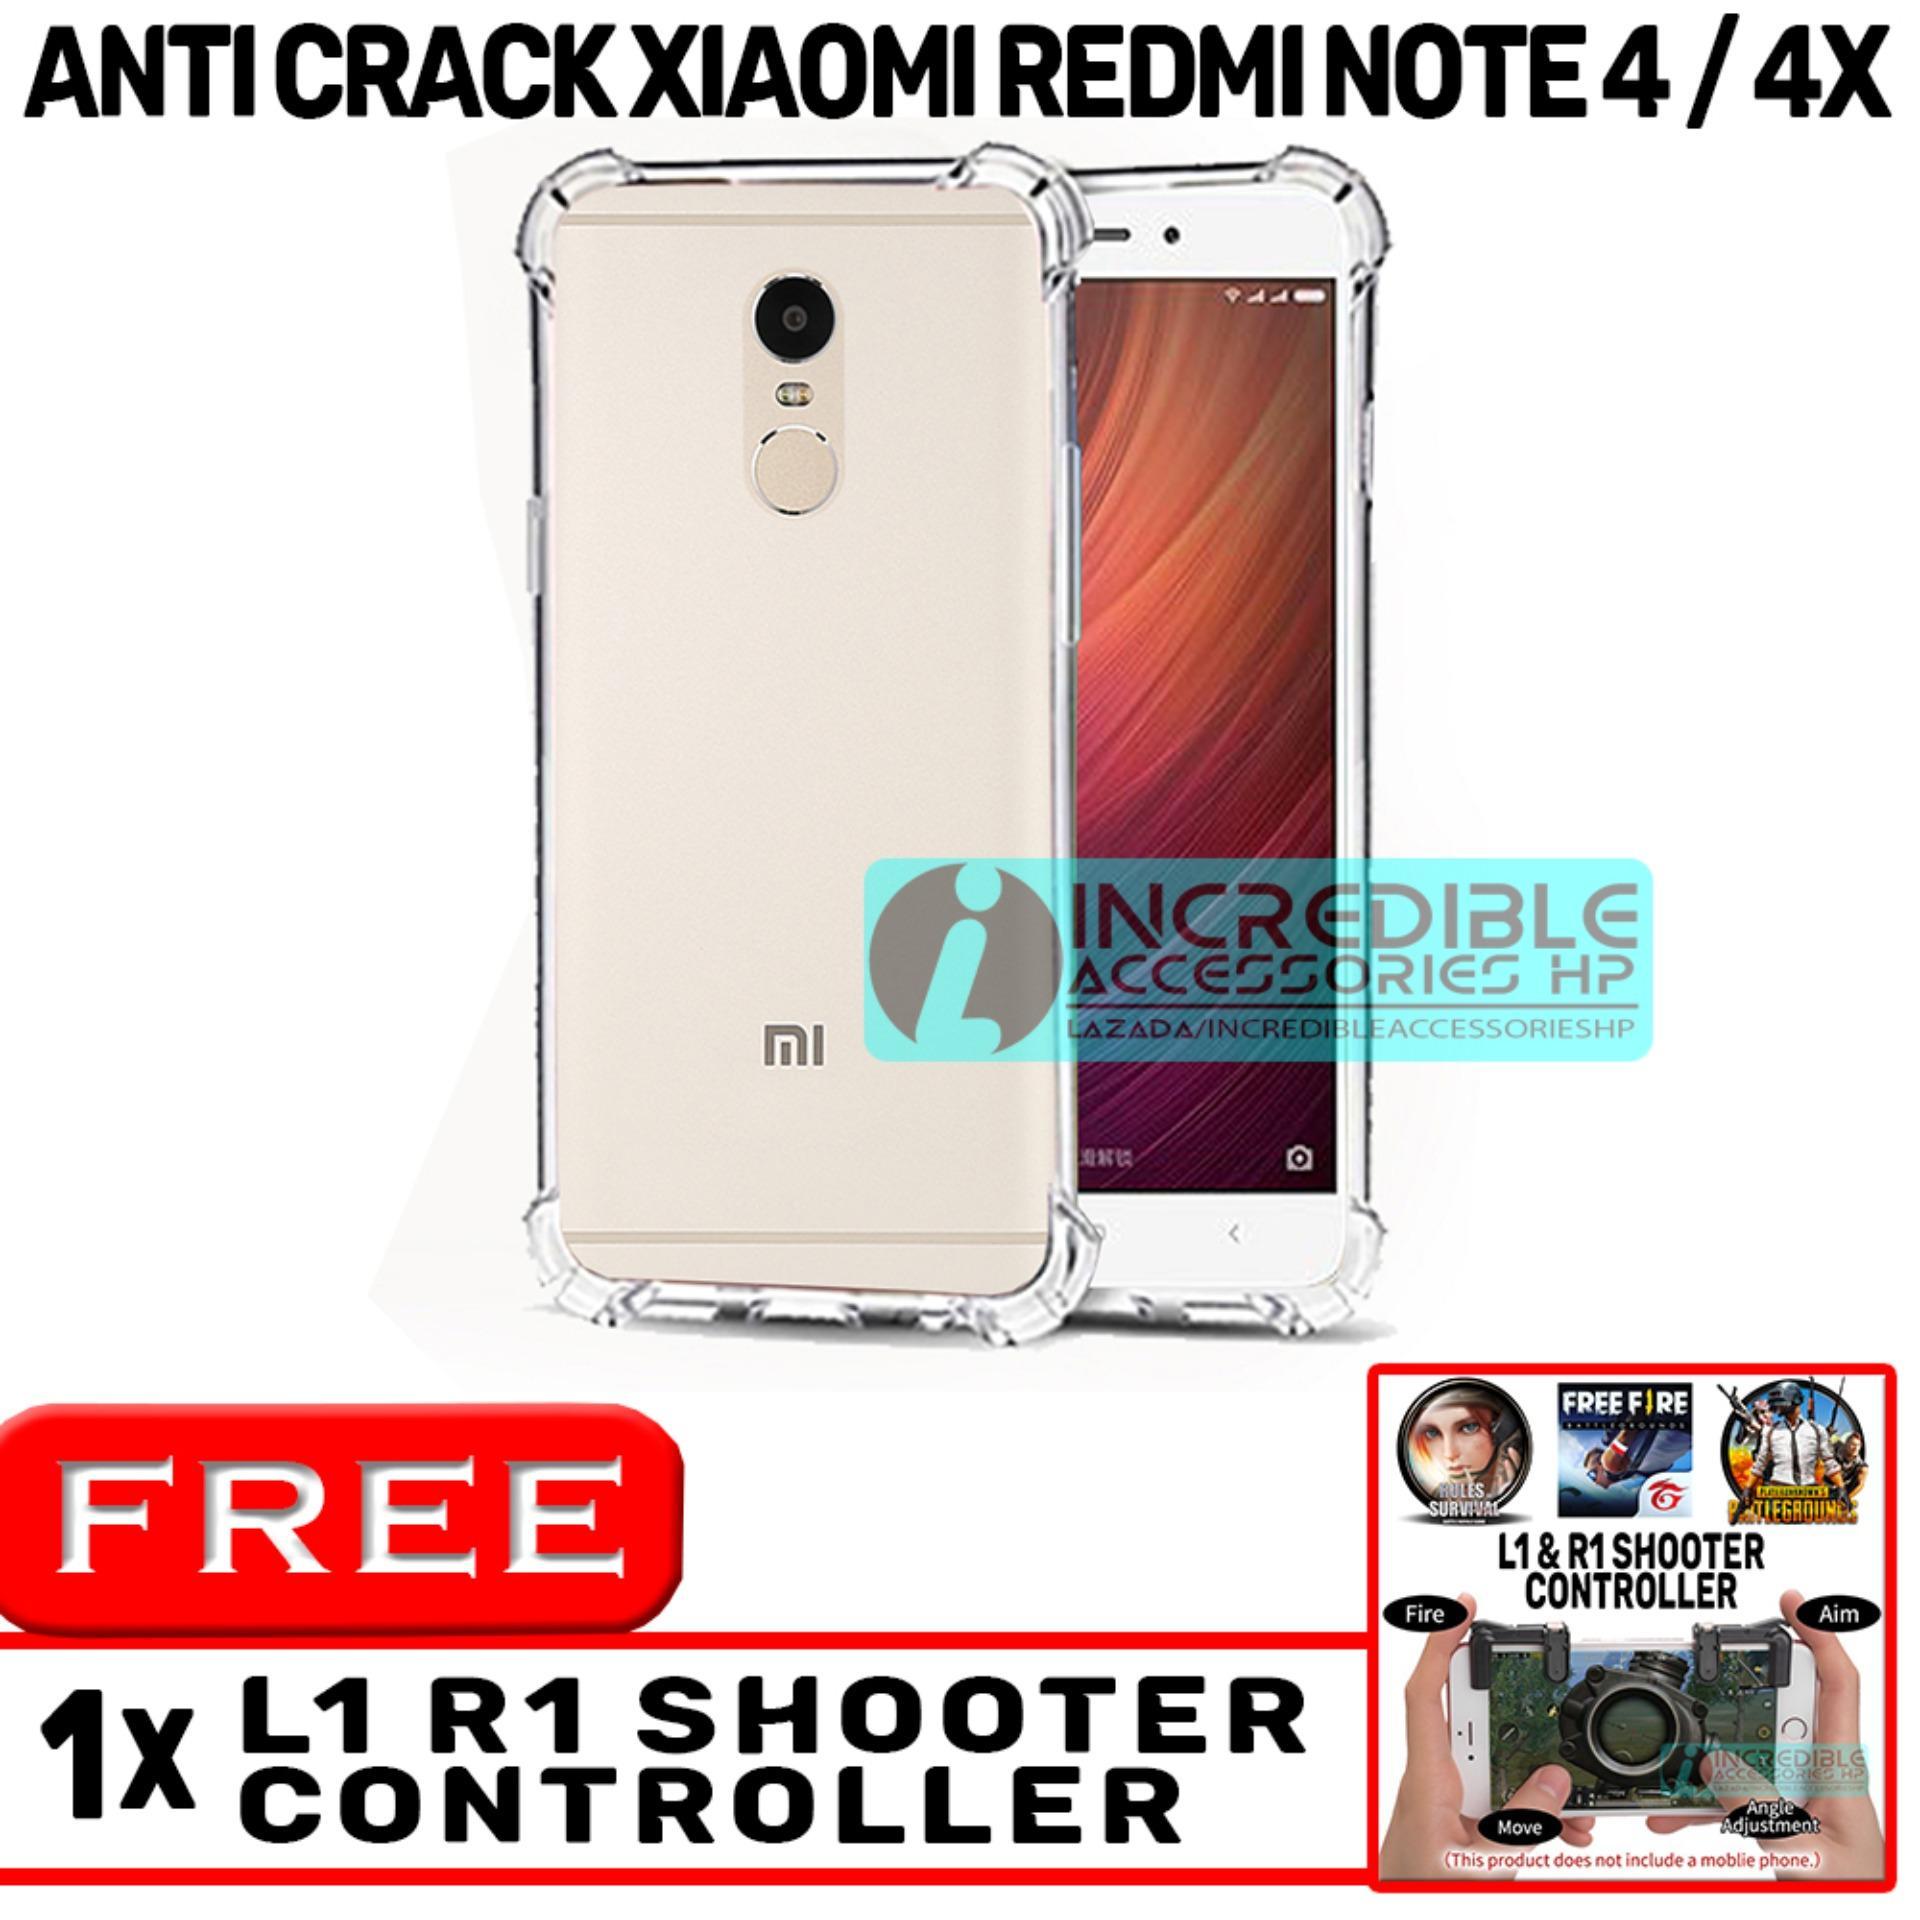 ... Baby Skin Slim + Case Anticrack Vivo Y81_BENING_fourten_shop. Source · Anti Crack for Xioami Redmi Note 4x (Snapdragon & Mediatek) Softcase Elegant Anti ...